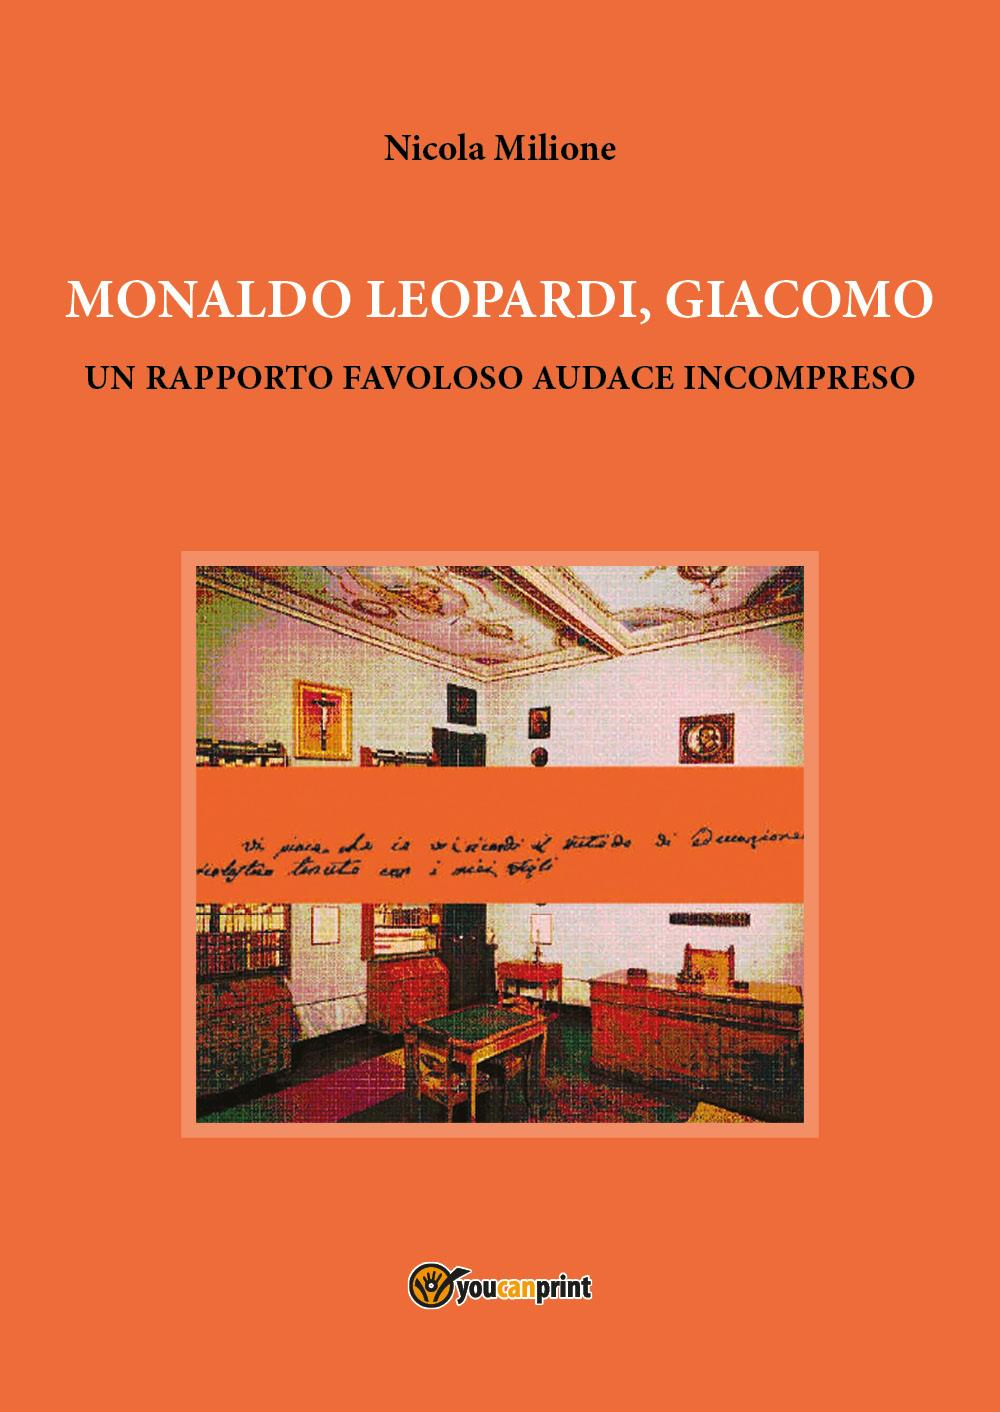 Monaldo Leopardi, Giacomo